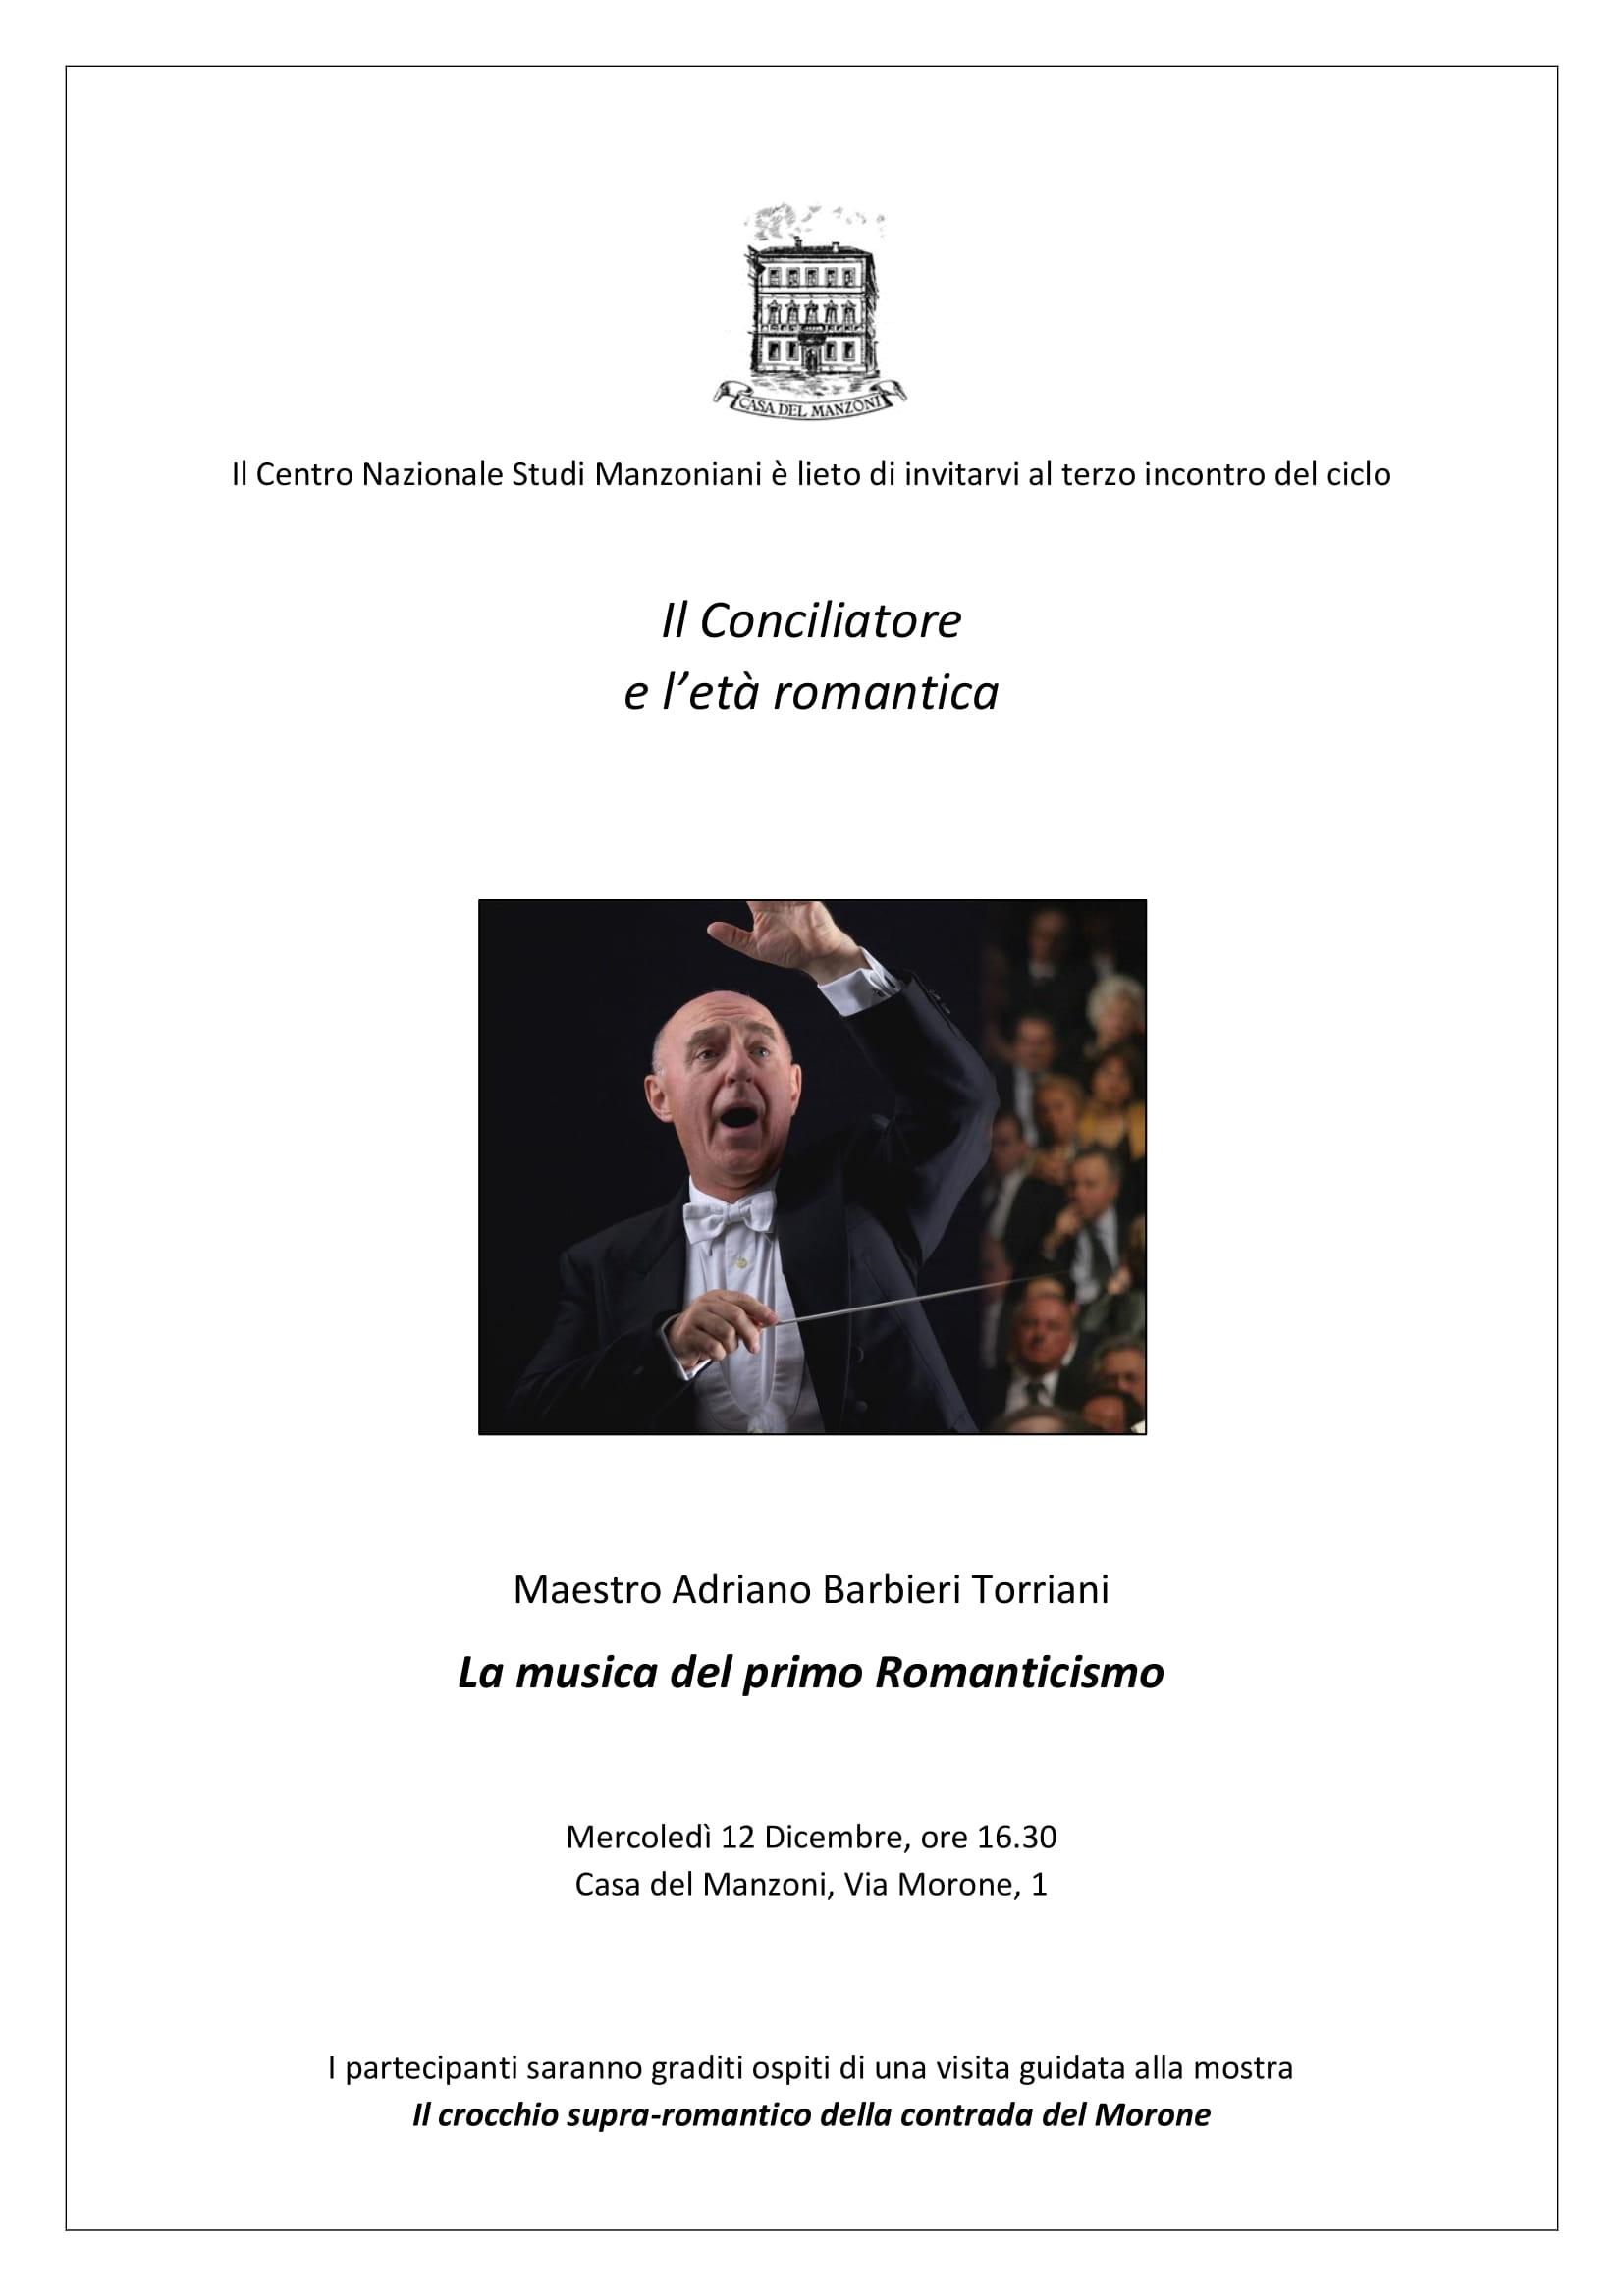 locandina Barbieri Torriani 12 dicembre-